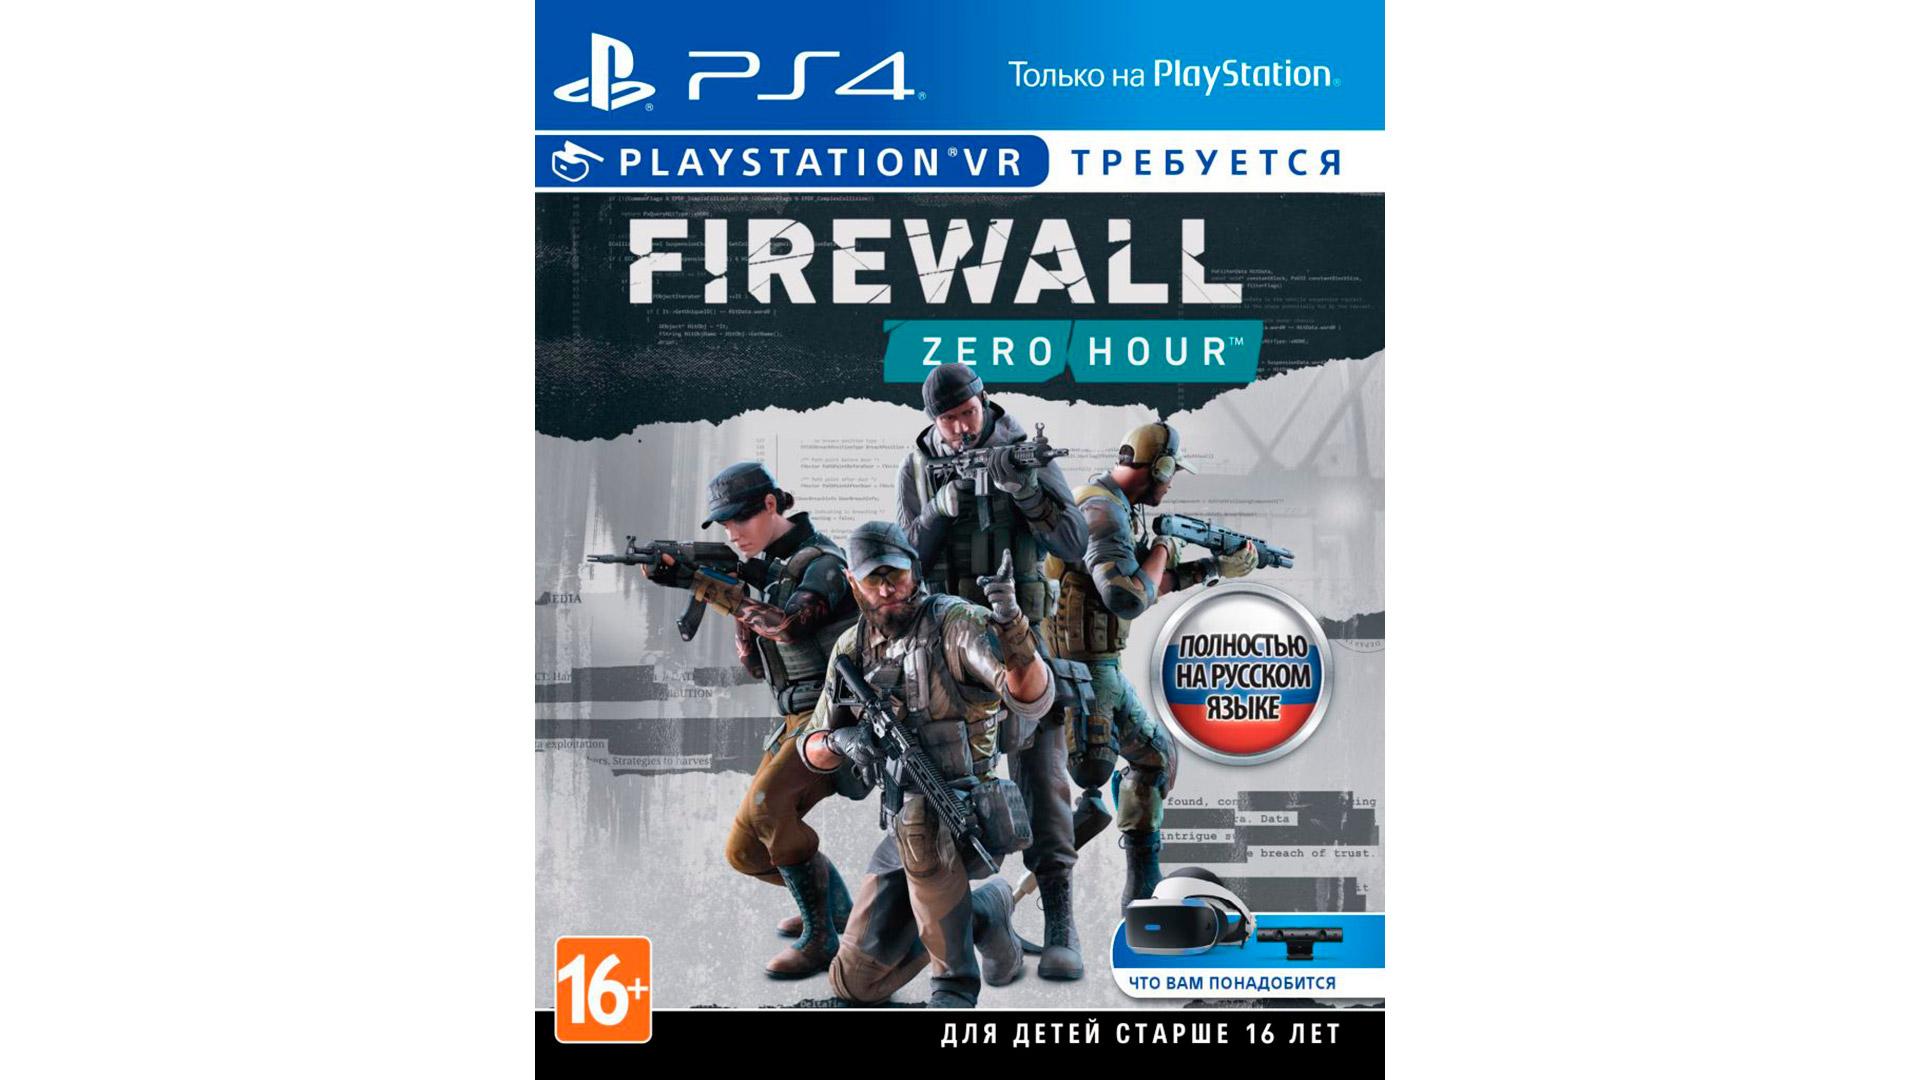 Firewall Zero Hour игра на PlayStation VR [FZHVR]